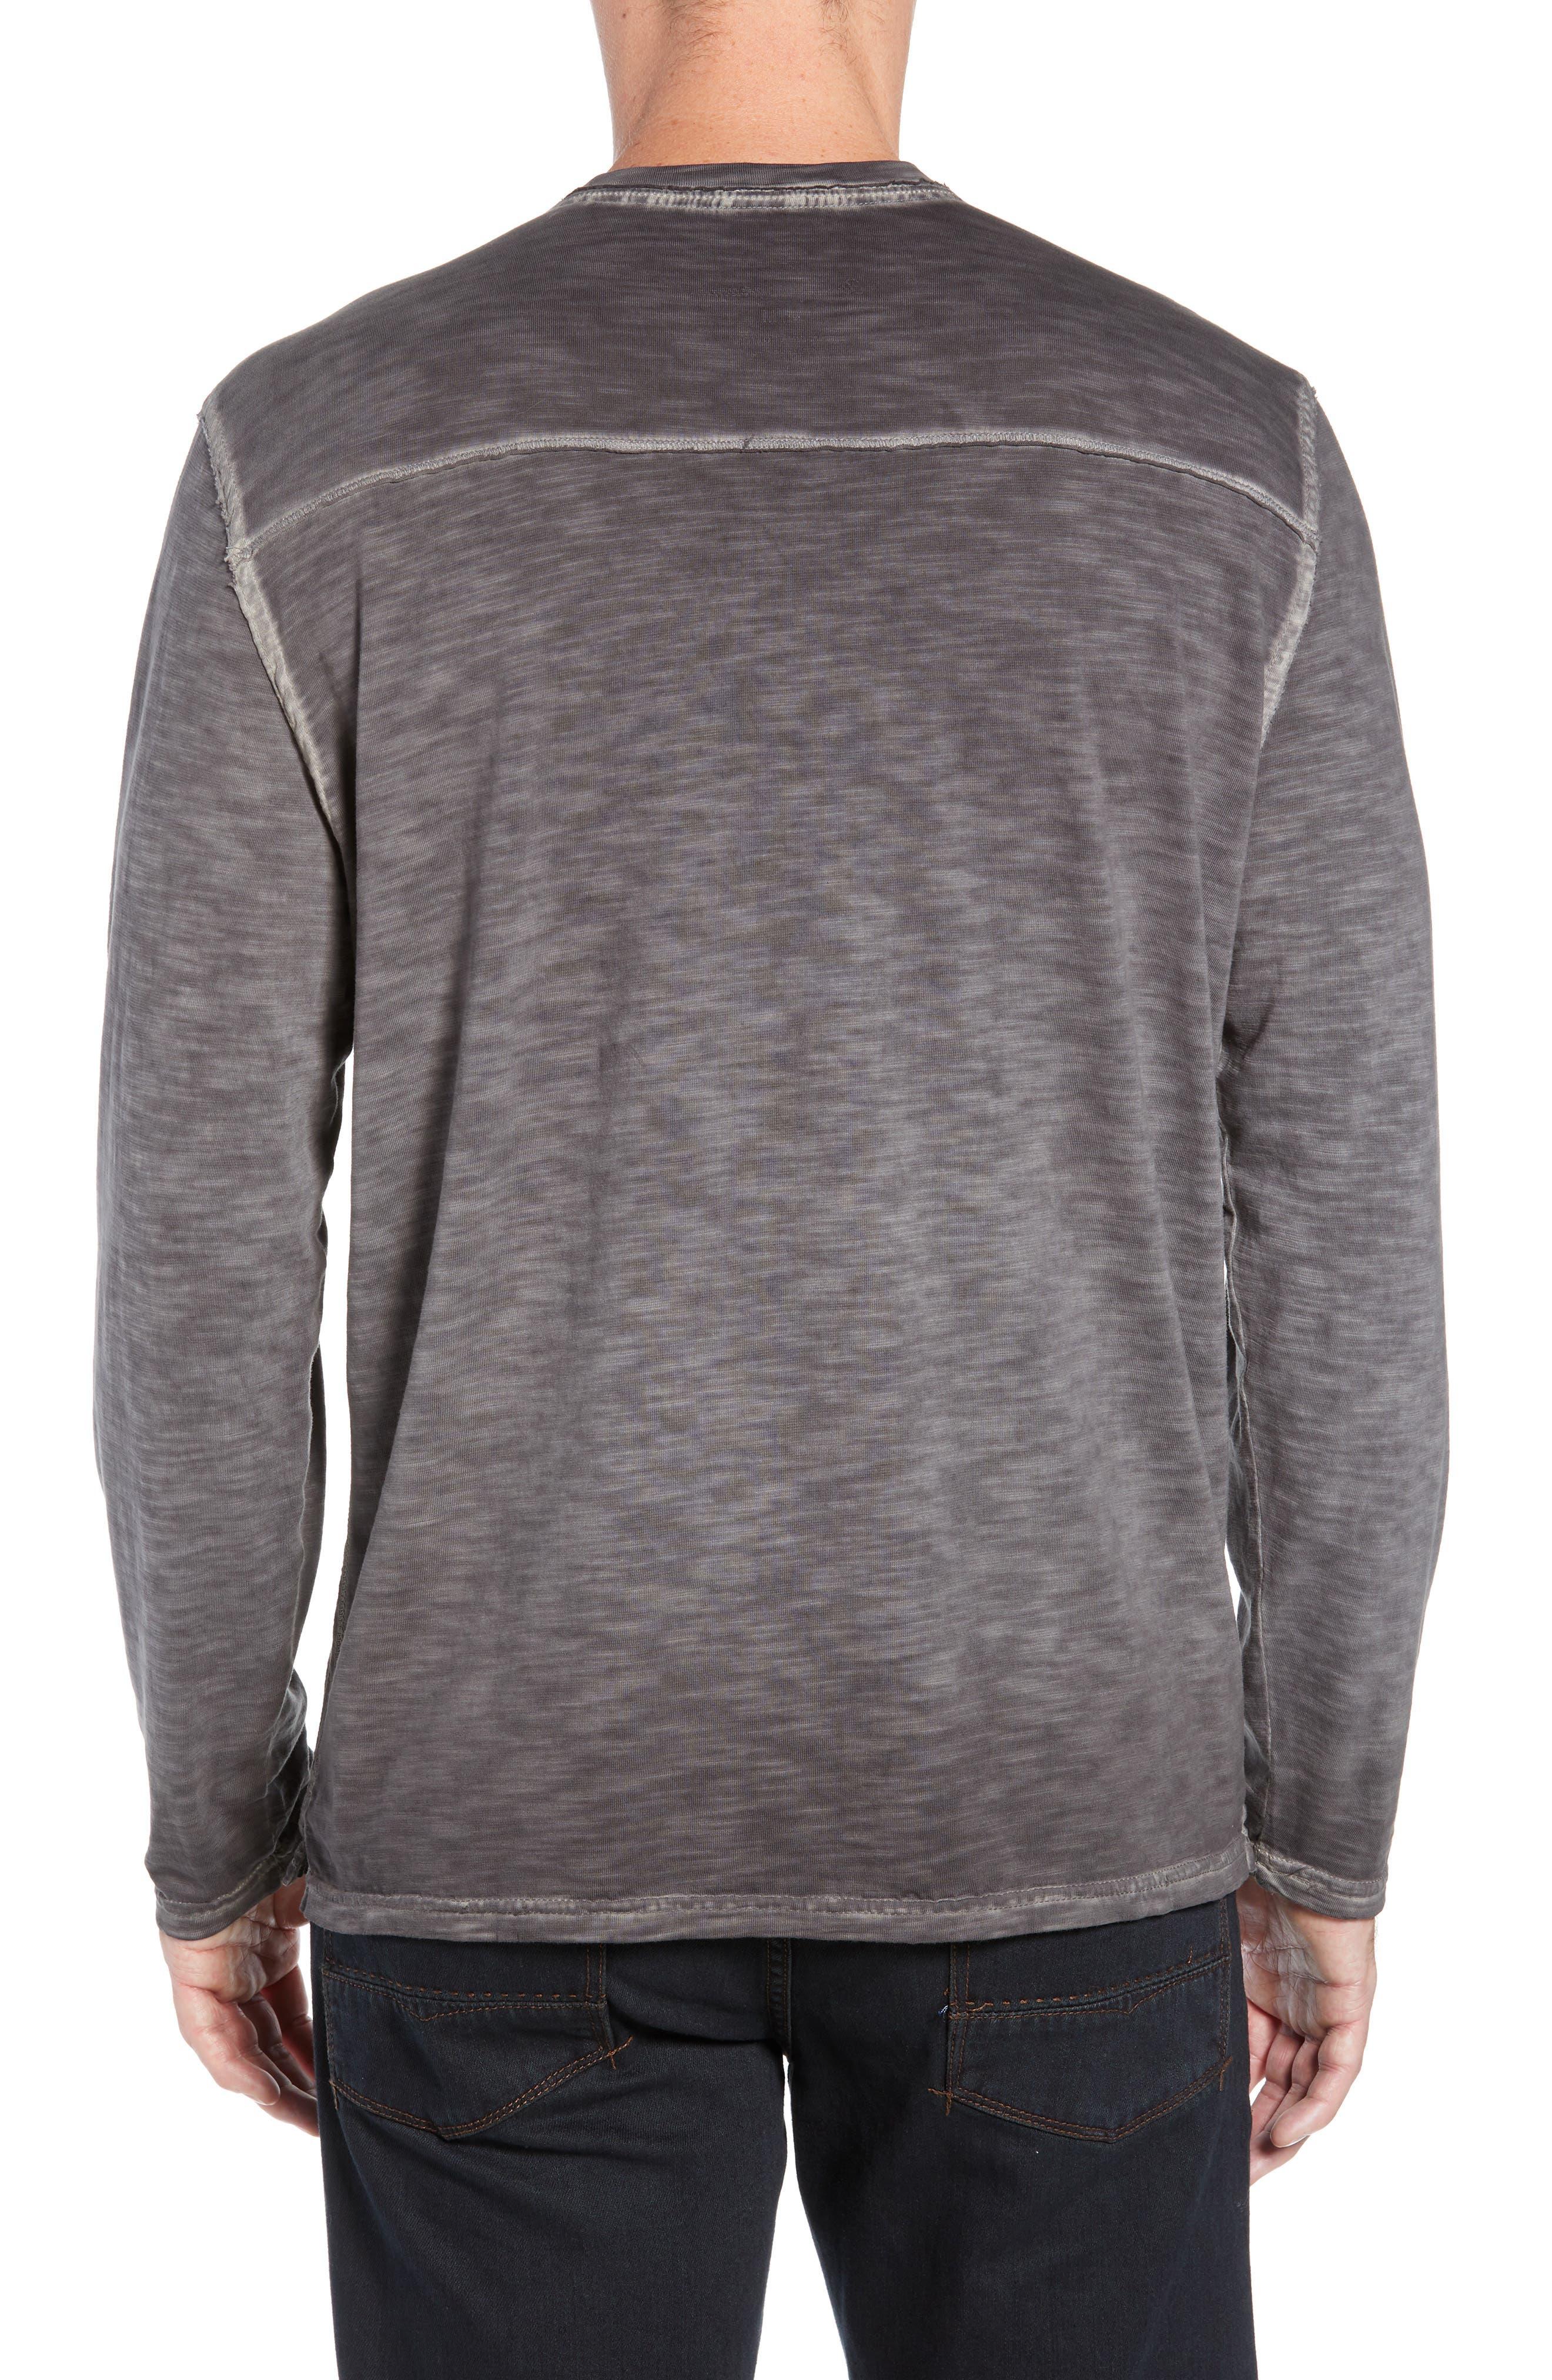 Suncoast Shores Long Sleeve V-Neck T-Shirt,                             Alternate thumbnail 2, color,                             COAL